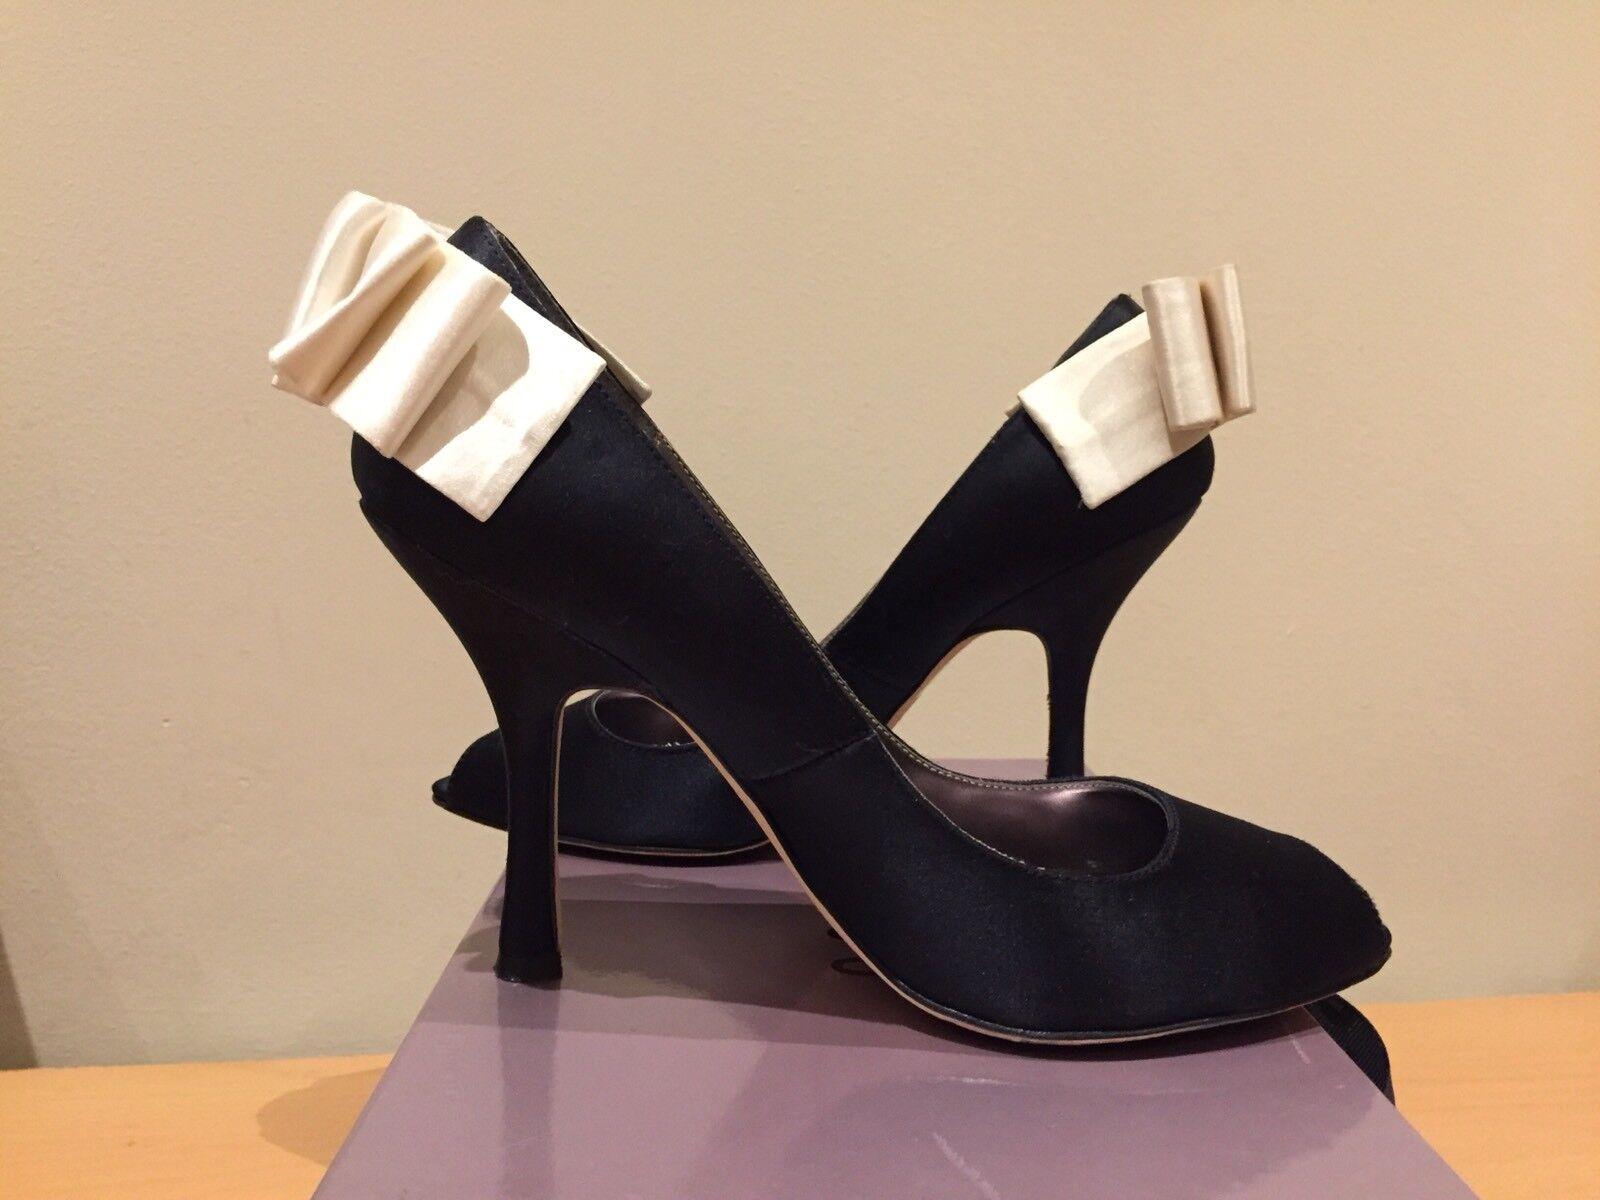 Coast Black Silk And Cream Bow Heels, 39, Uk 6 Party, Wedding Guest, Cruise, Fab